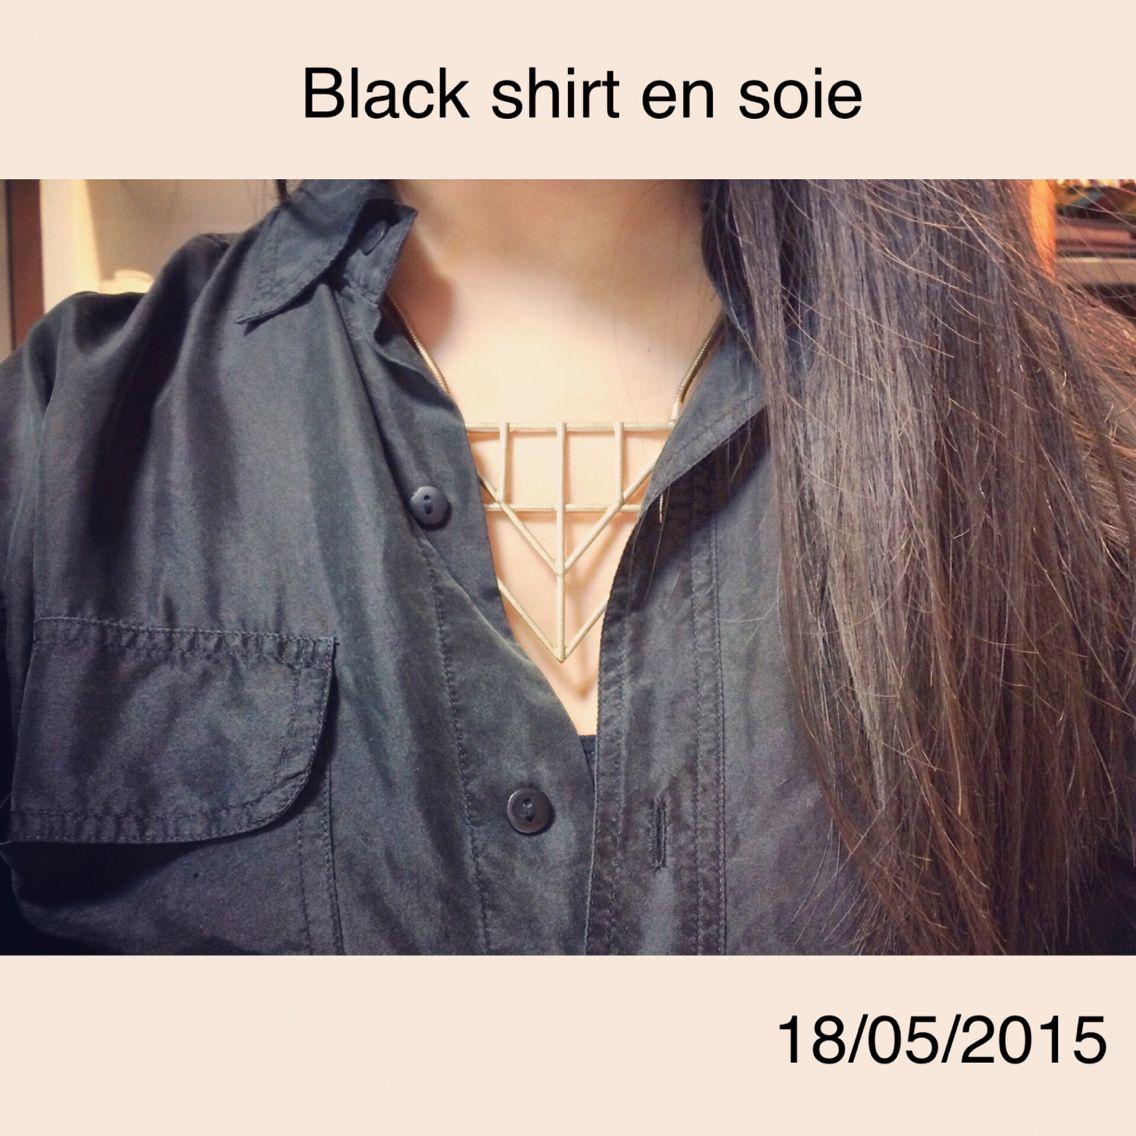 Black shirt en soie